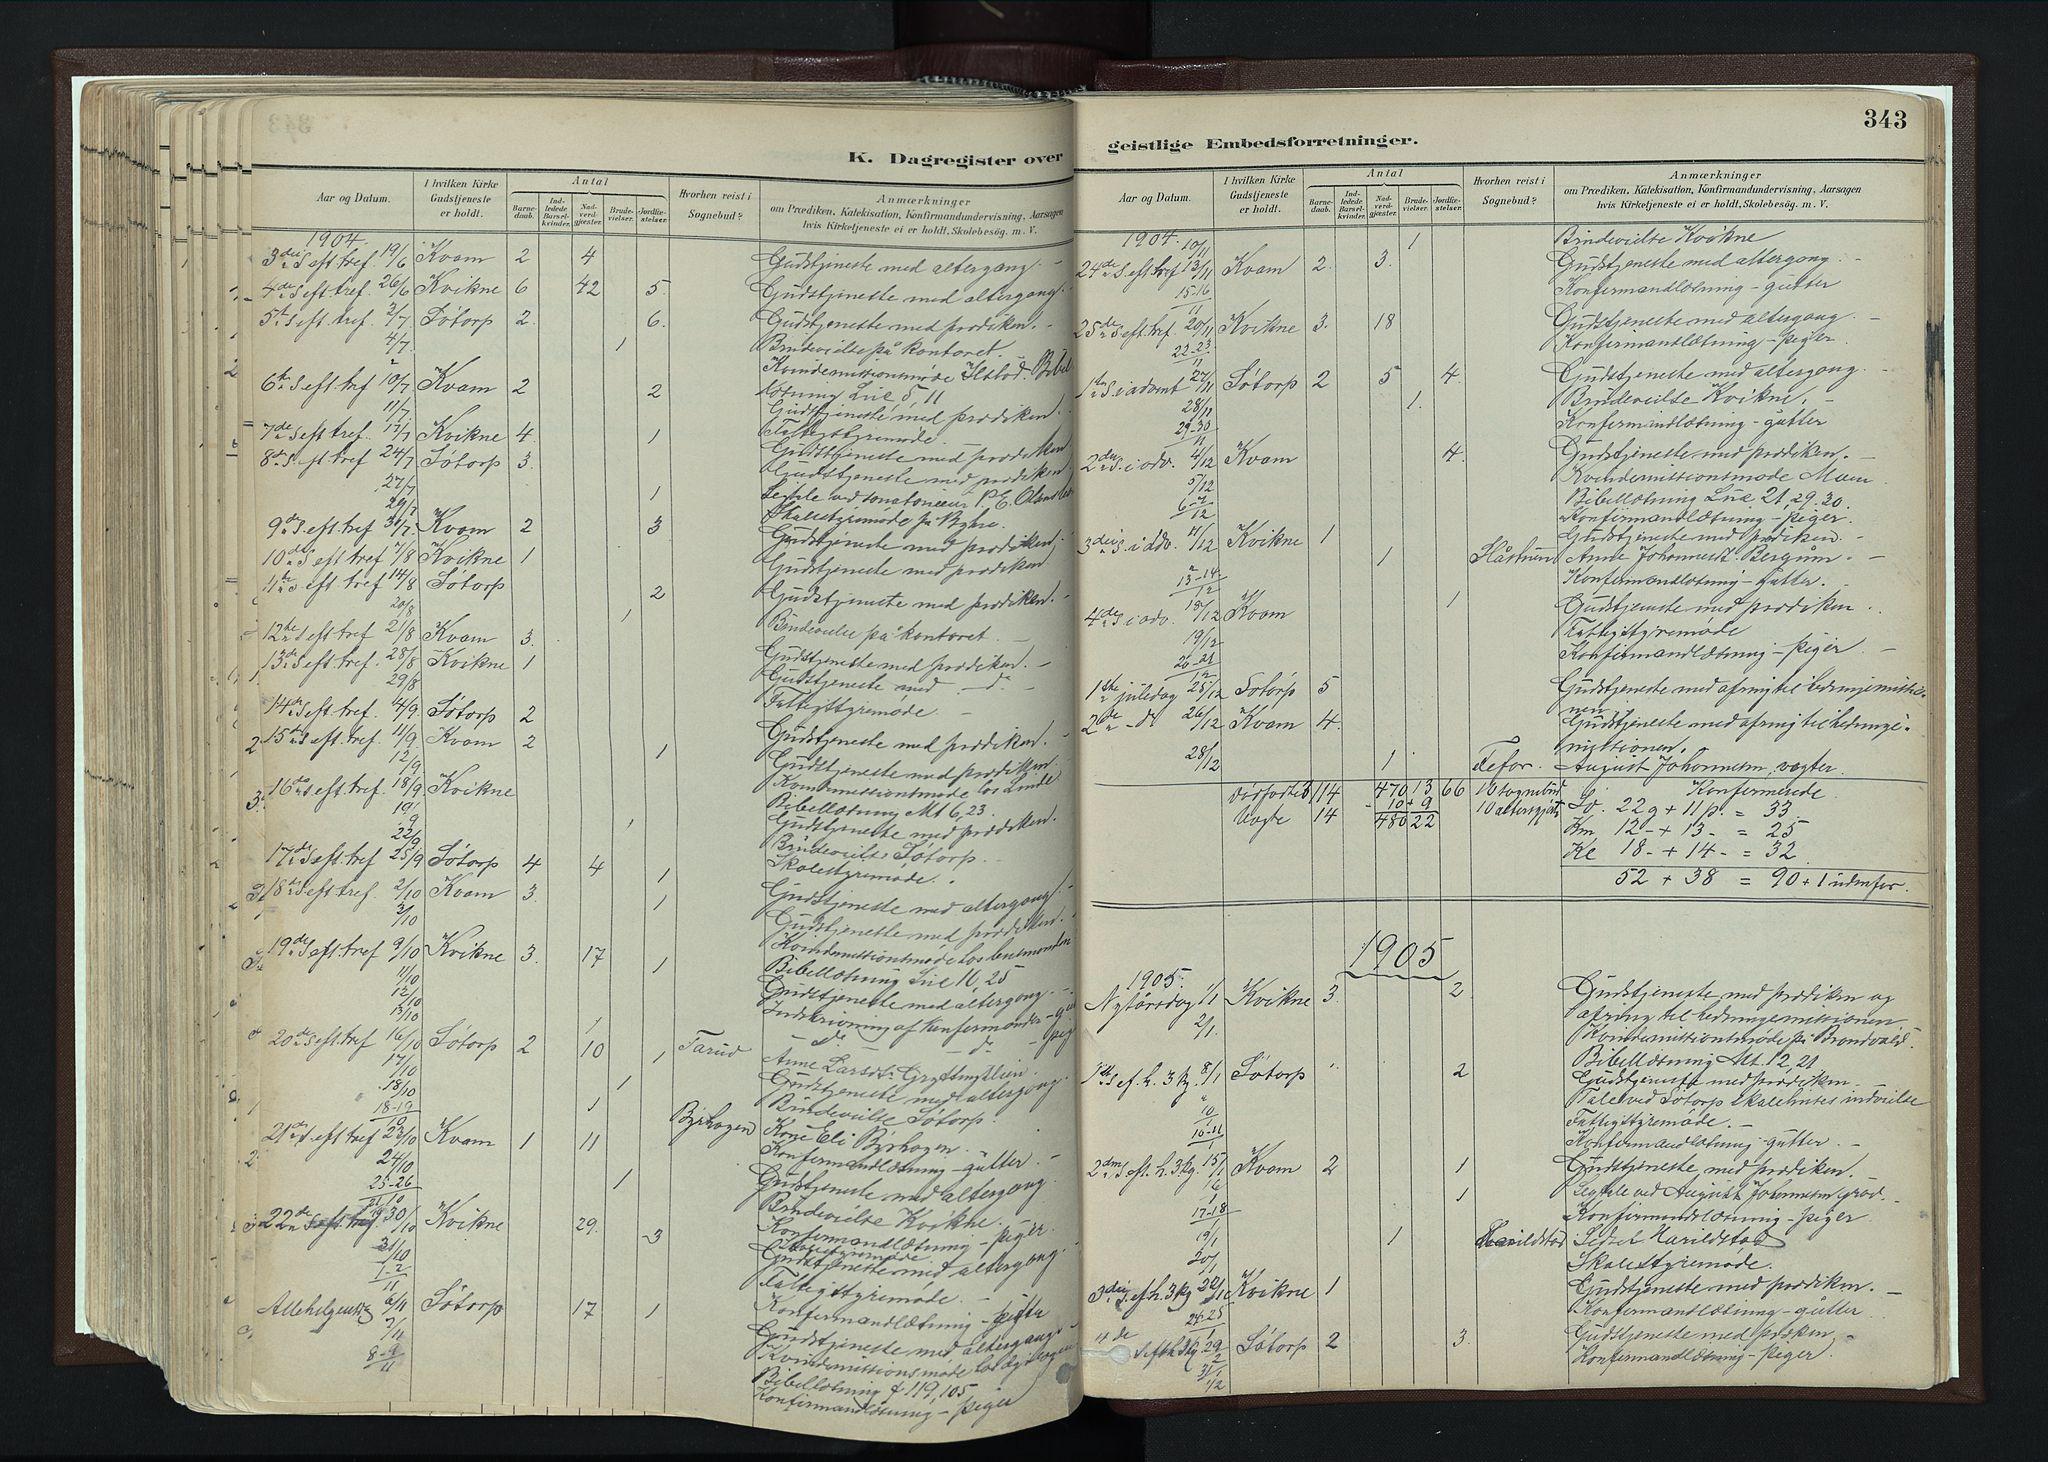 SAH, Nord-Fron prestekontor, Ministerialbok nr. 4, 1884-1914, s. 343